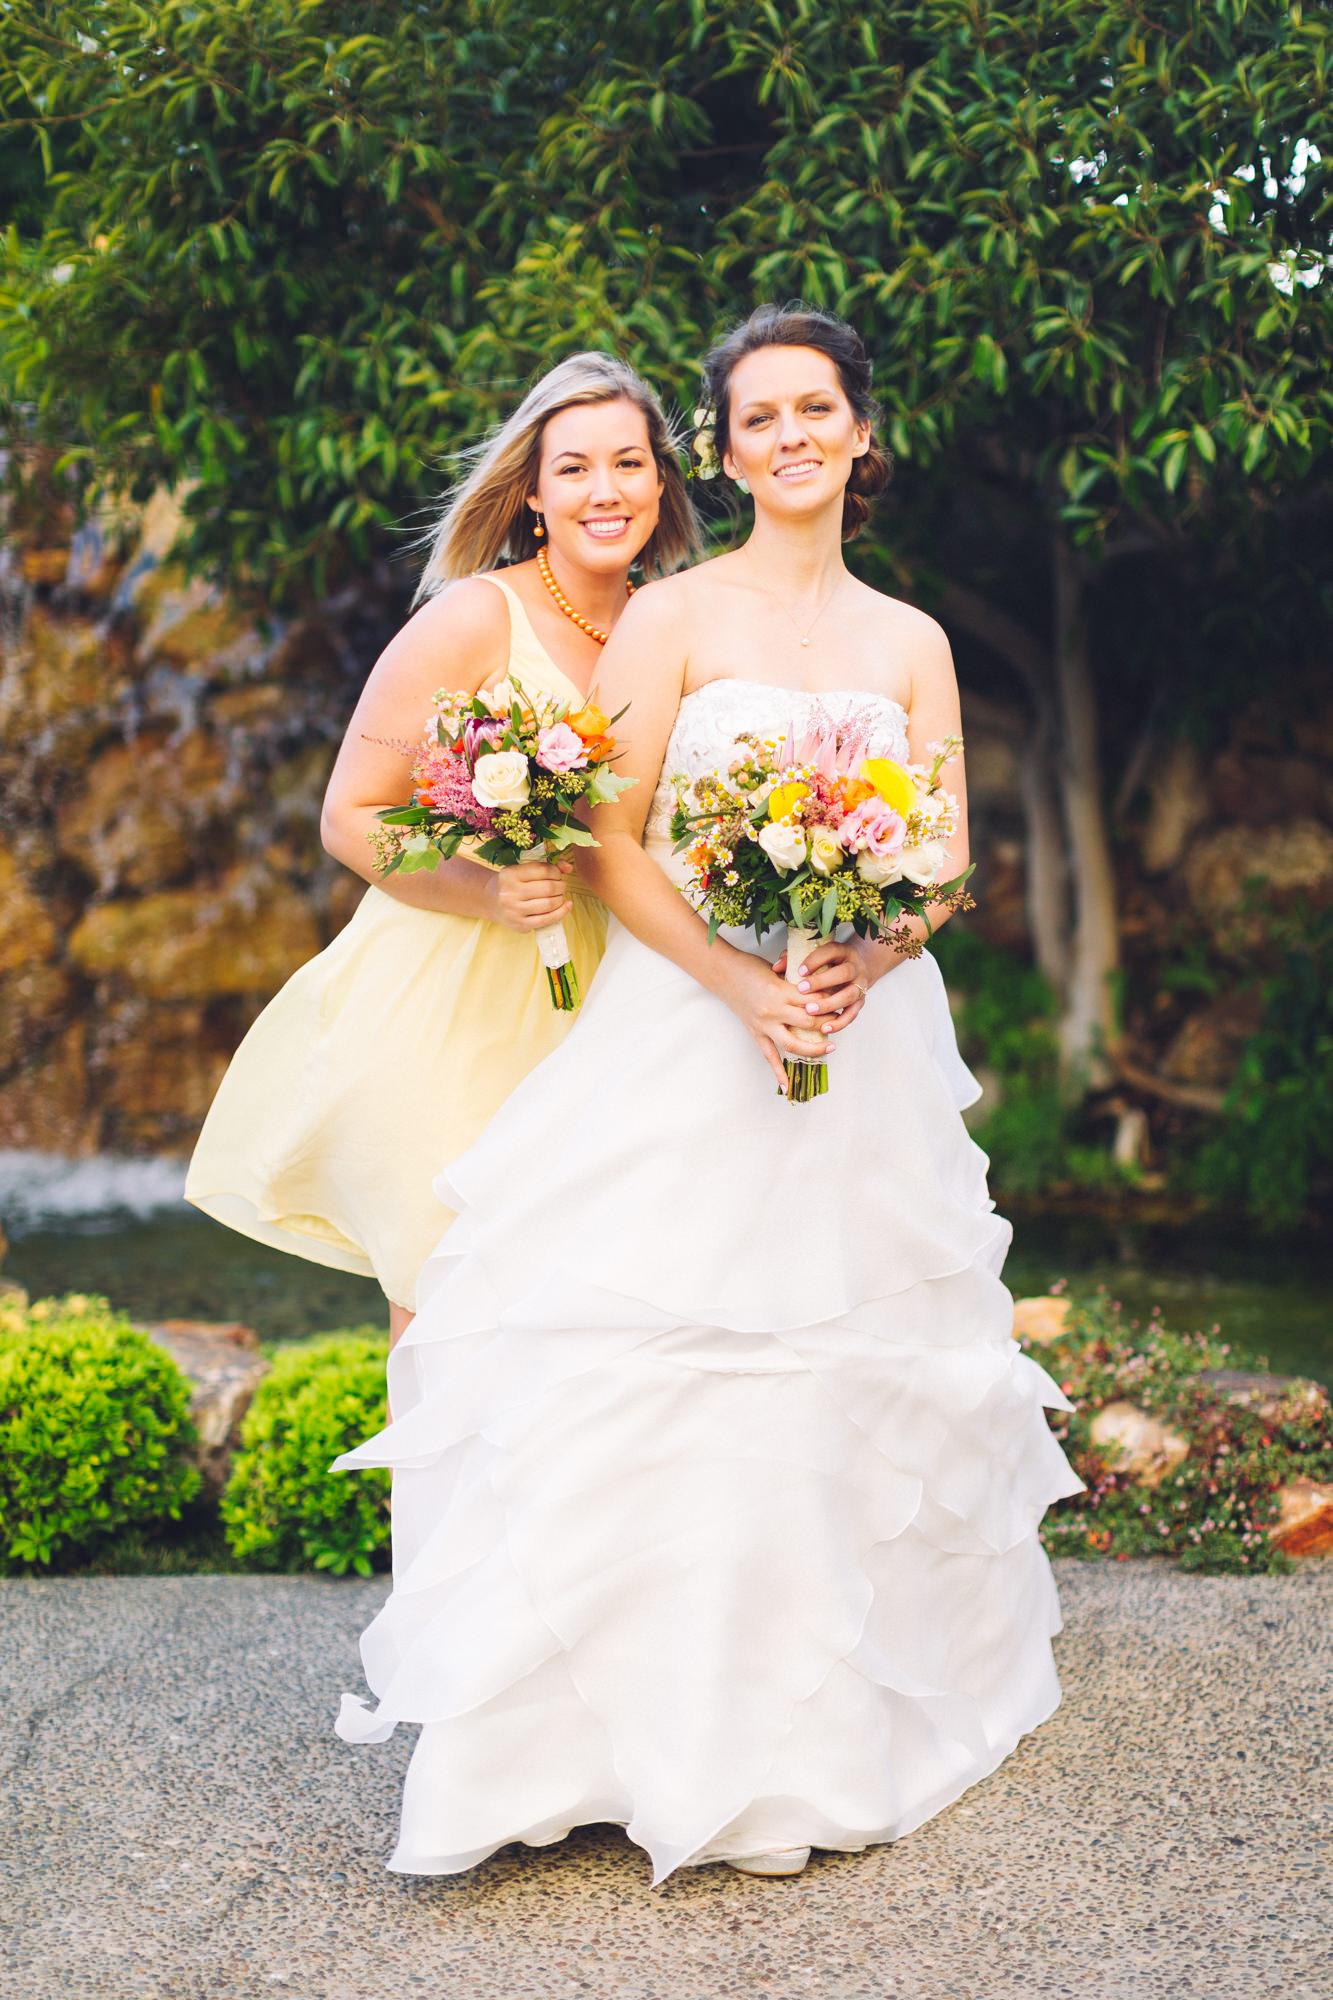 thelightandglass-wedding-engagement-photography-099.jpg